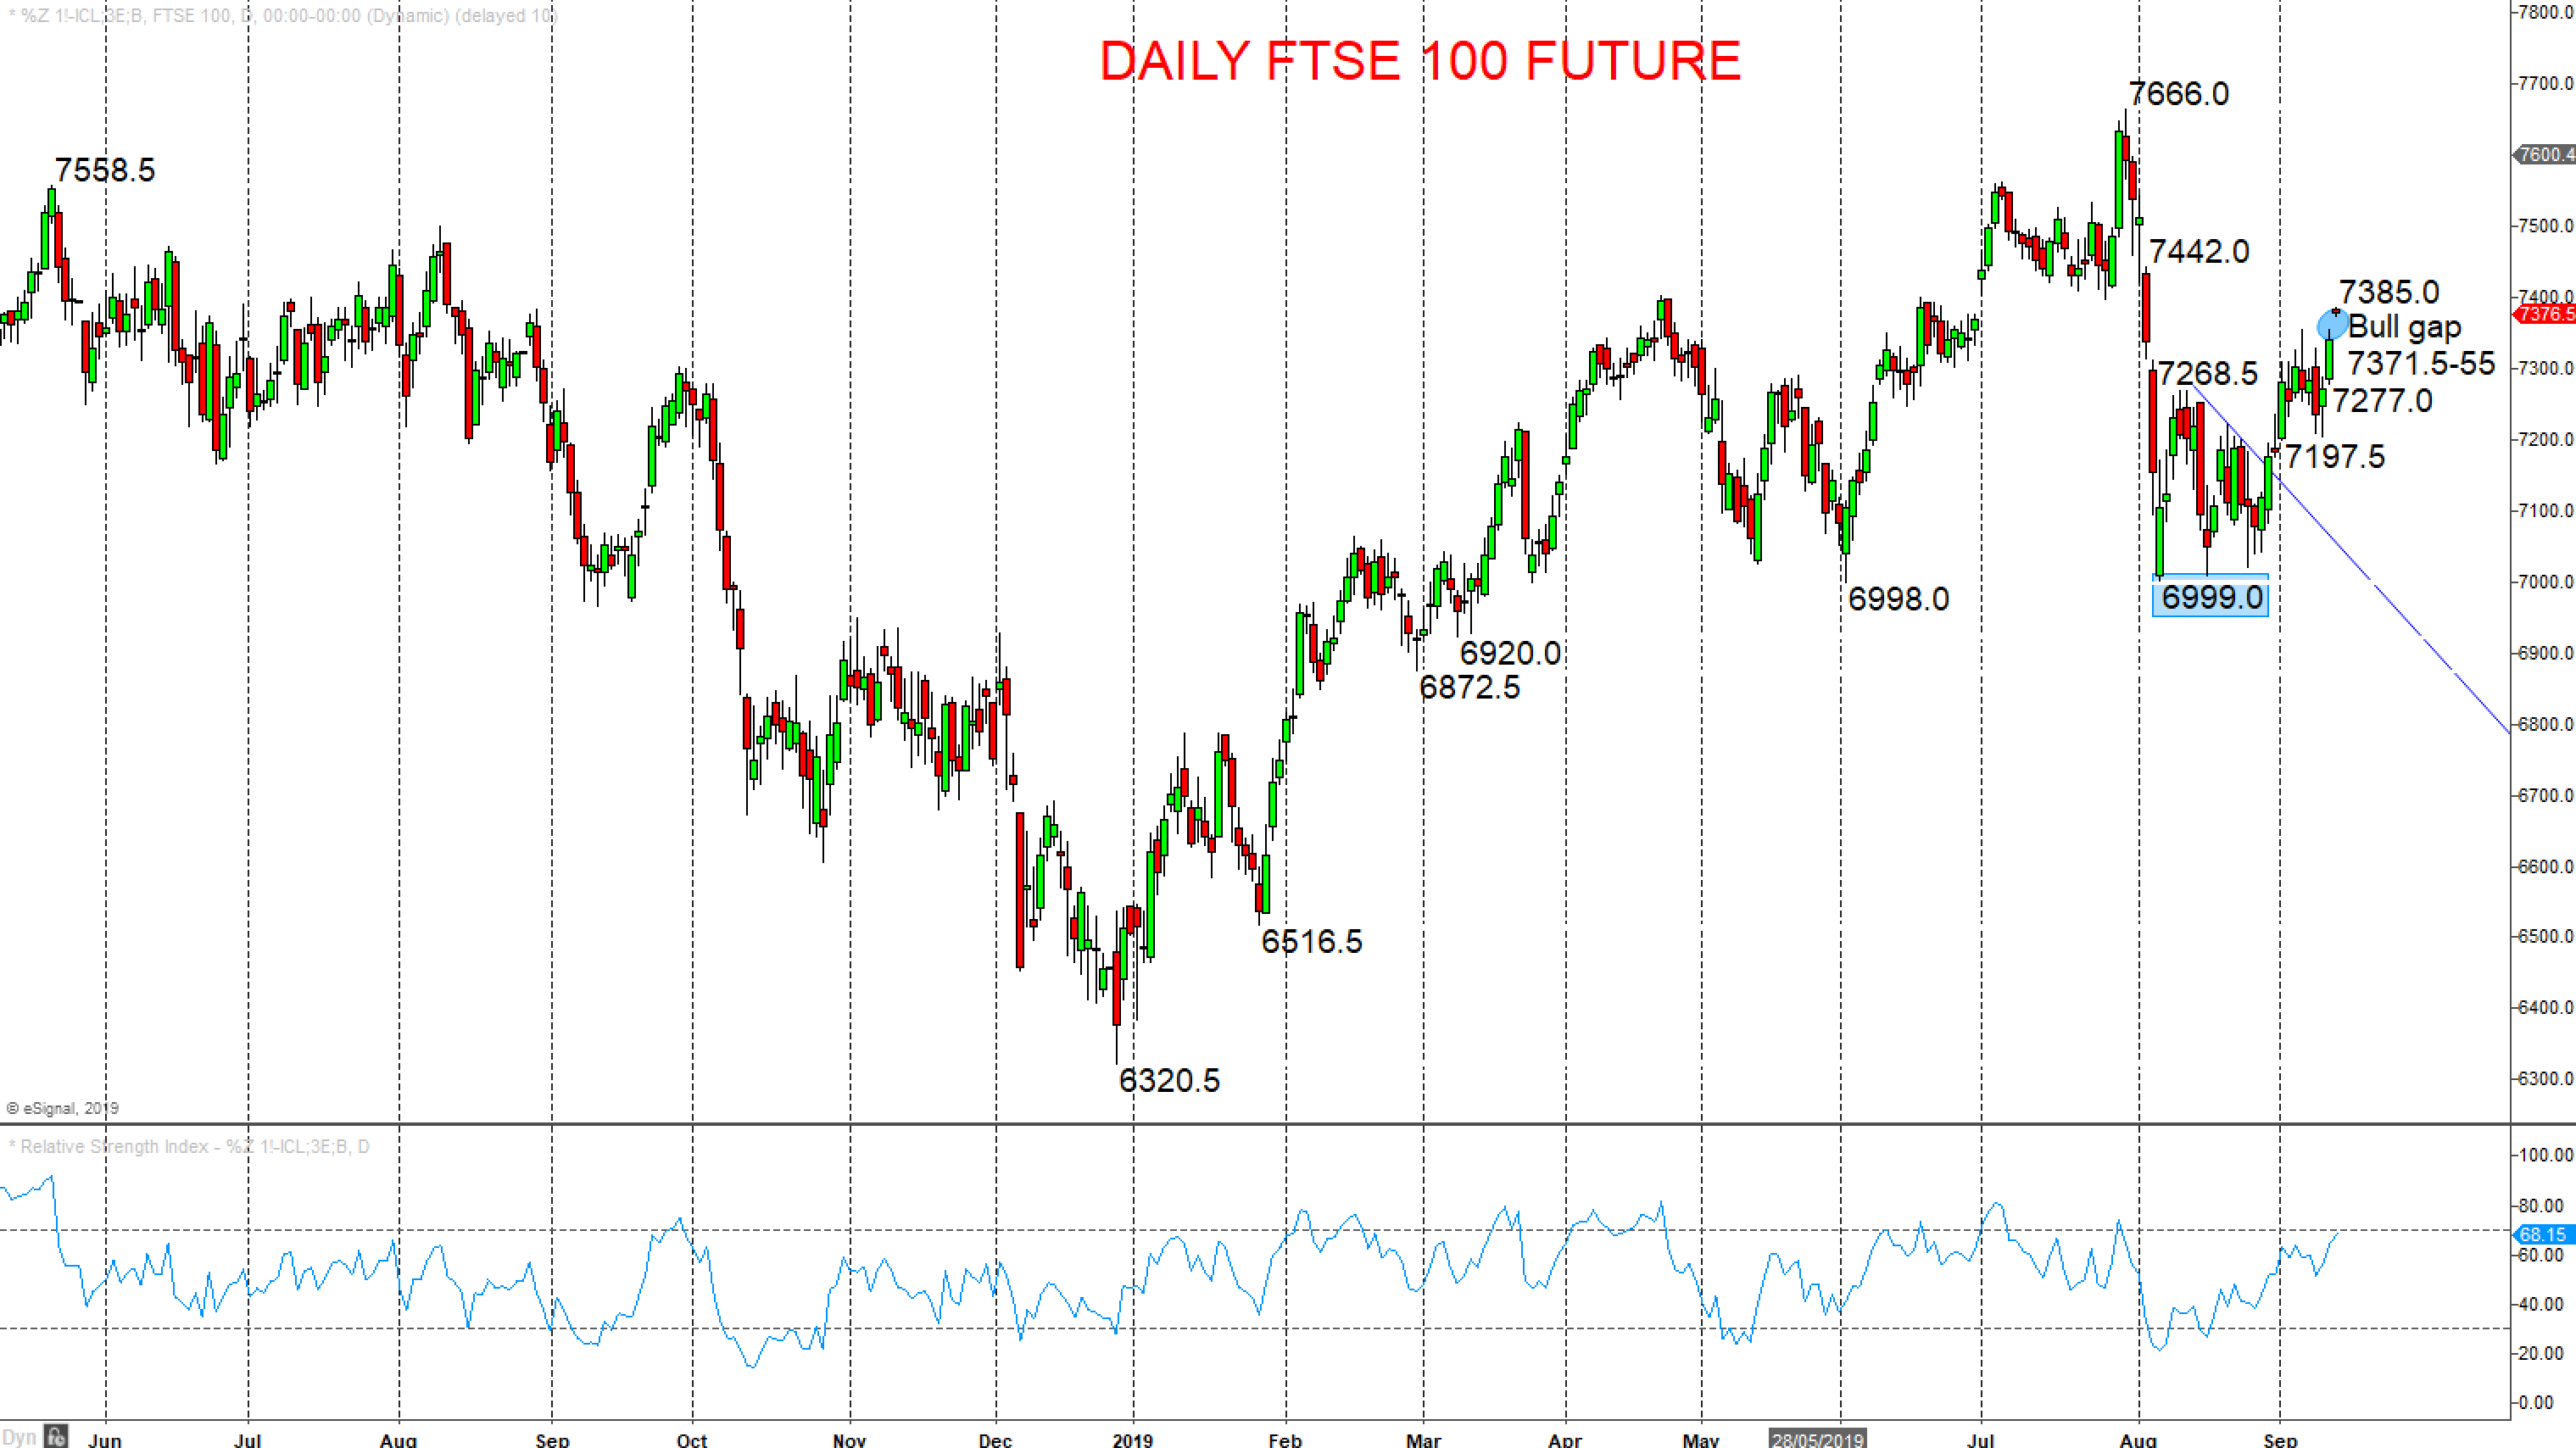 Daily FTSE 100 Future Chart